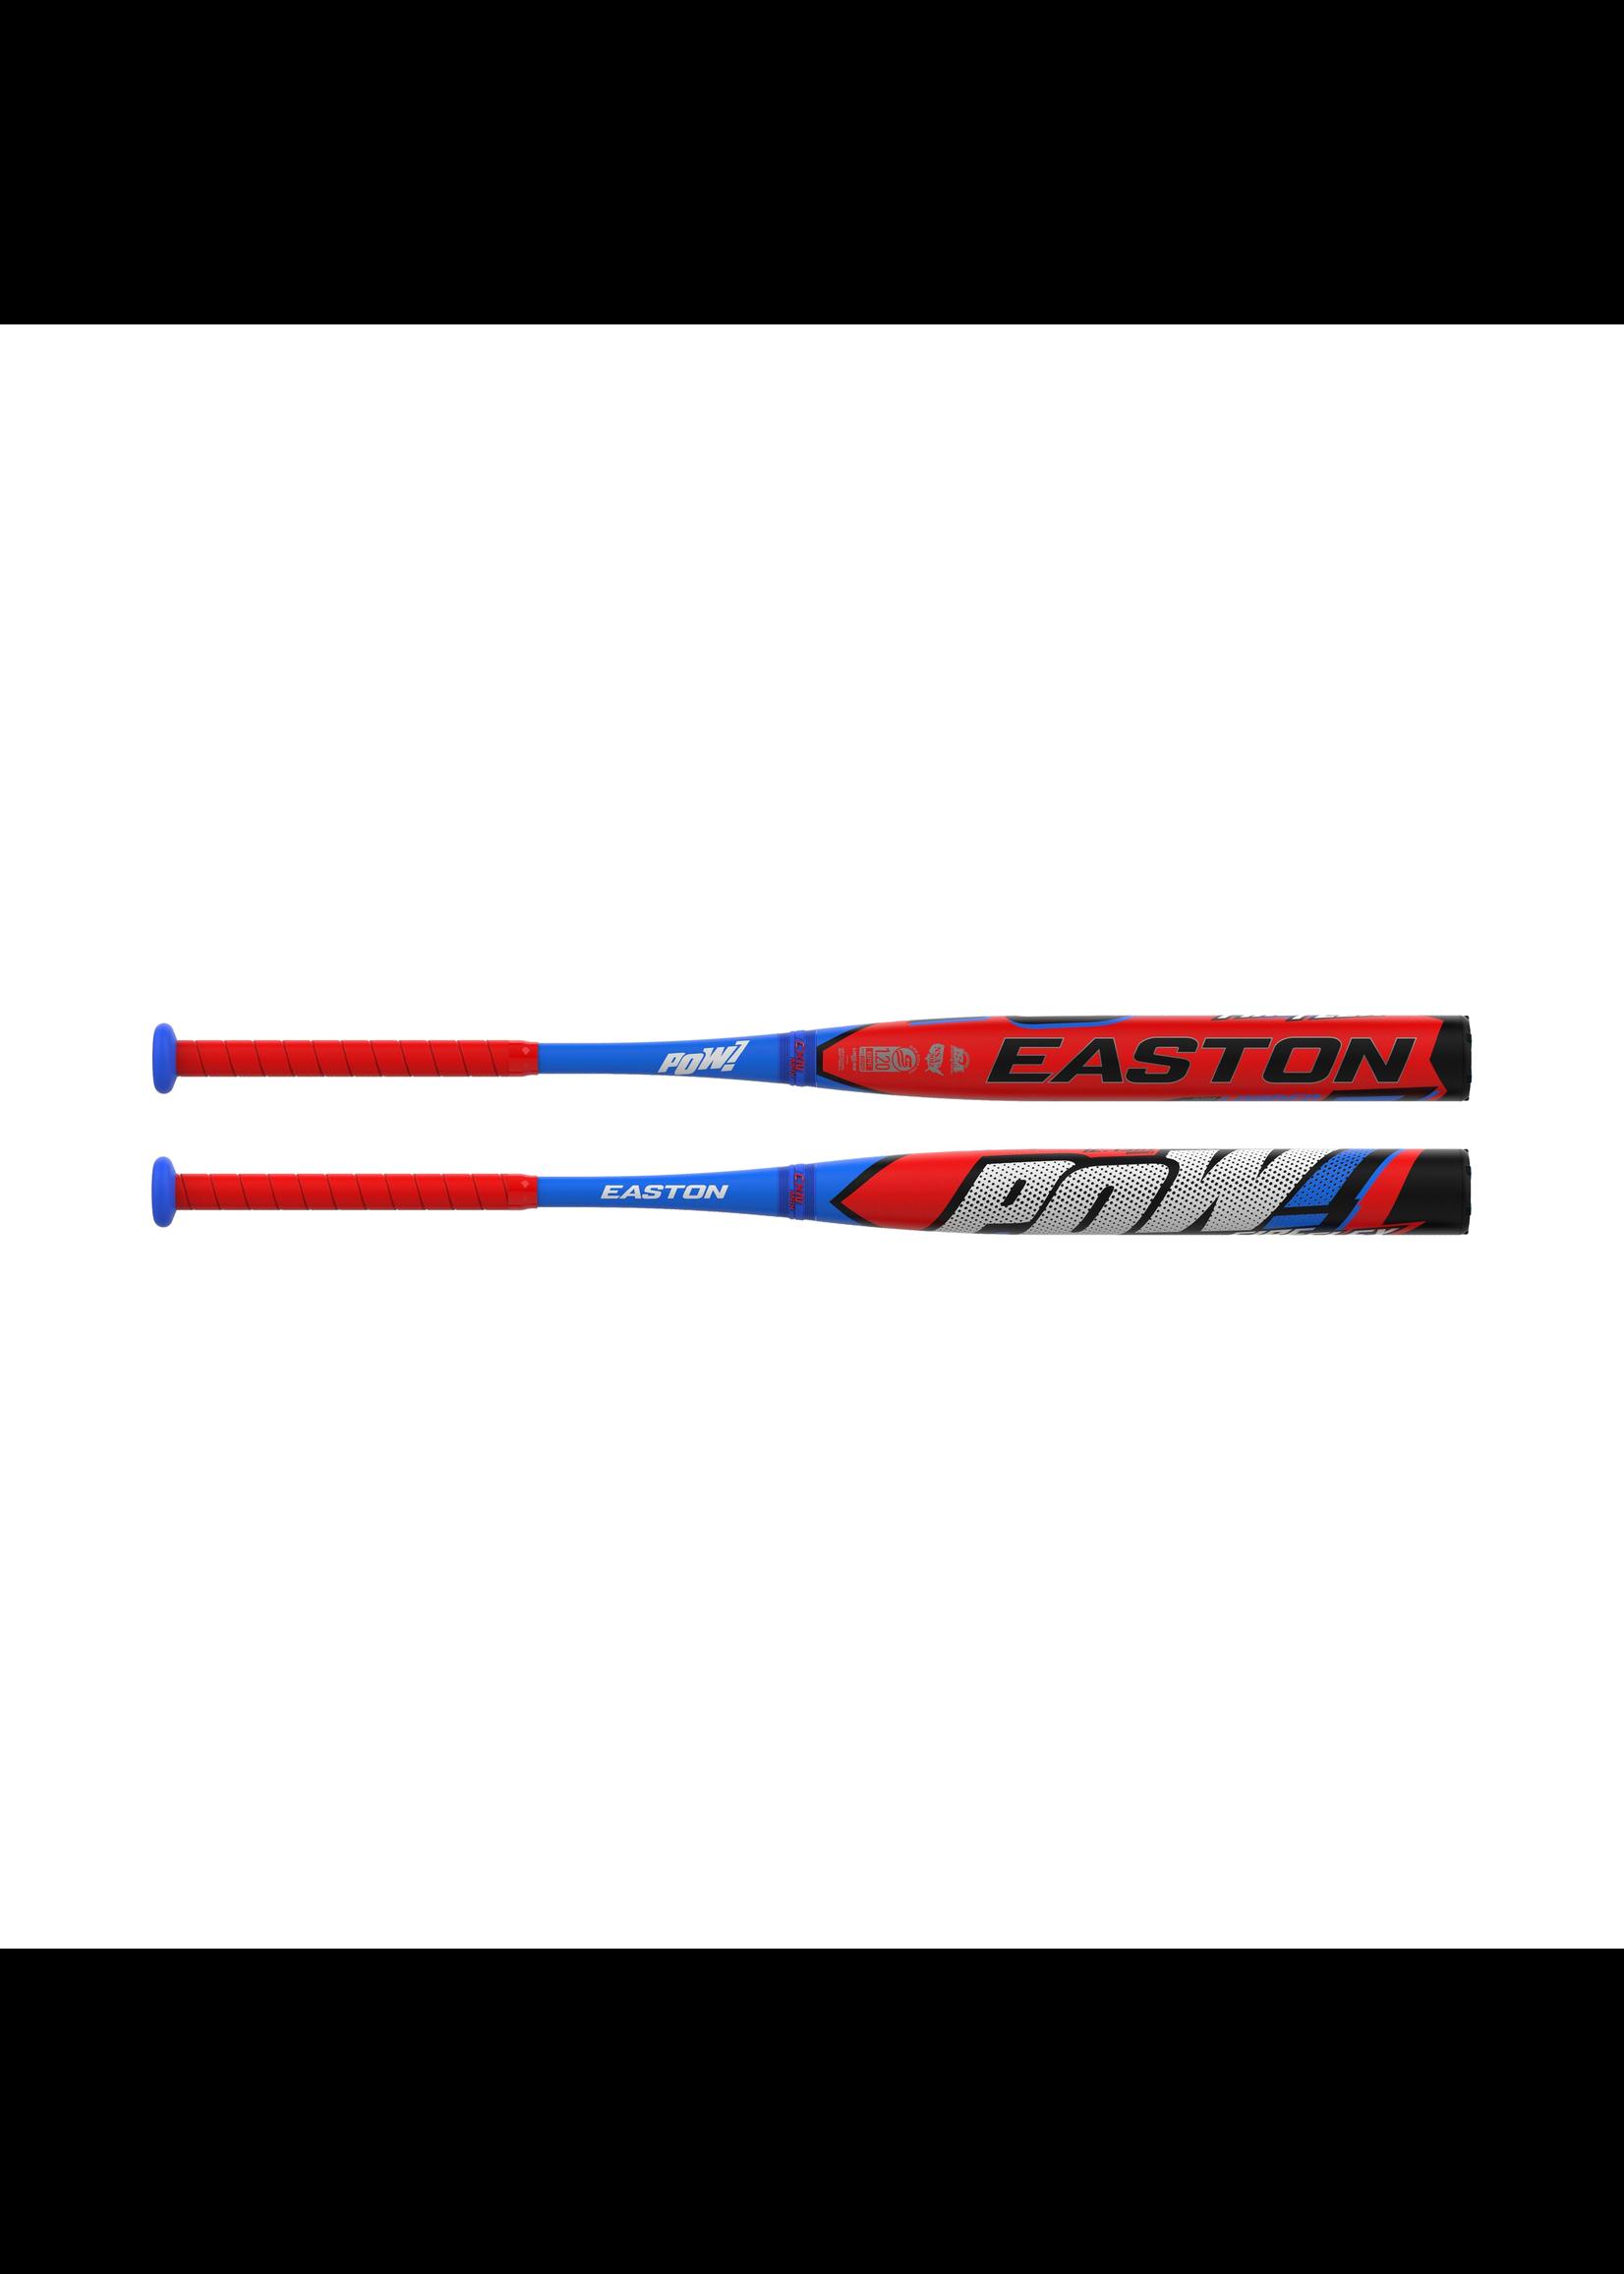 Easton Baseball (Canada) EASTON FIRE FLEX COMIC POW END LOAD 12.75 USSSA BÂTON SLOWPITCH